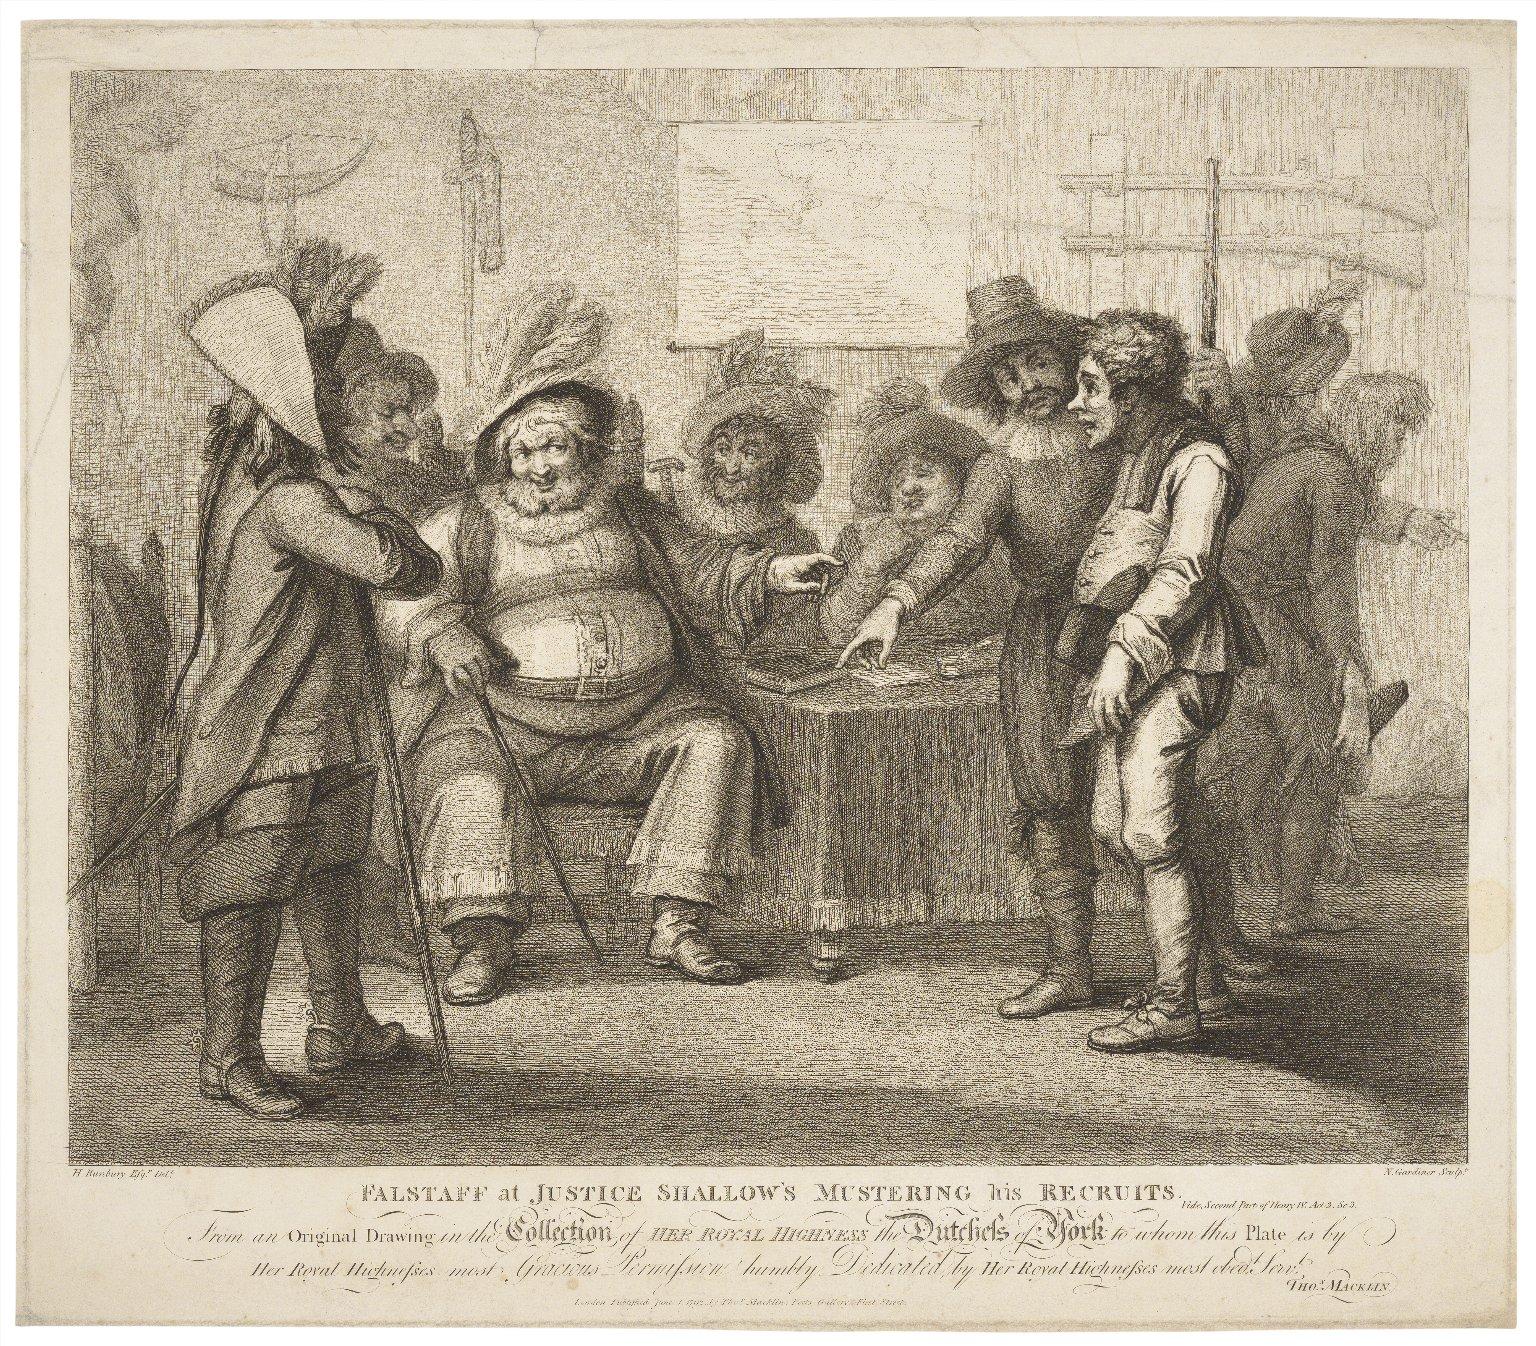 Falstaff at Justice Shallow's mustering his recruits ... Second part of Henry IV, act 3, sc. 3 [i.e. 2] ... [graphic] / H. Bunbury esqr. delt. ; N. Gardiner sculpt.